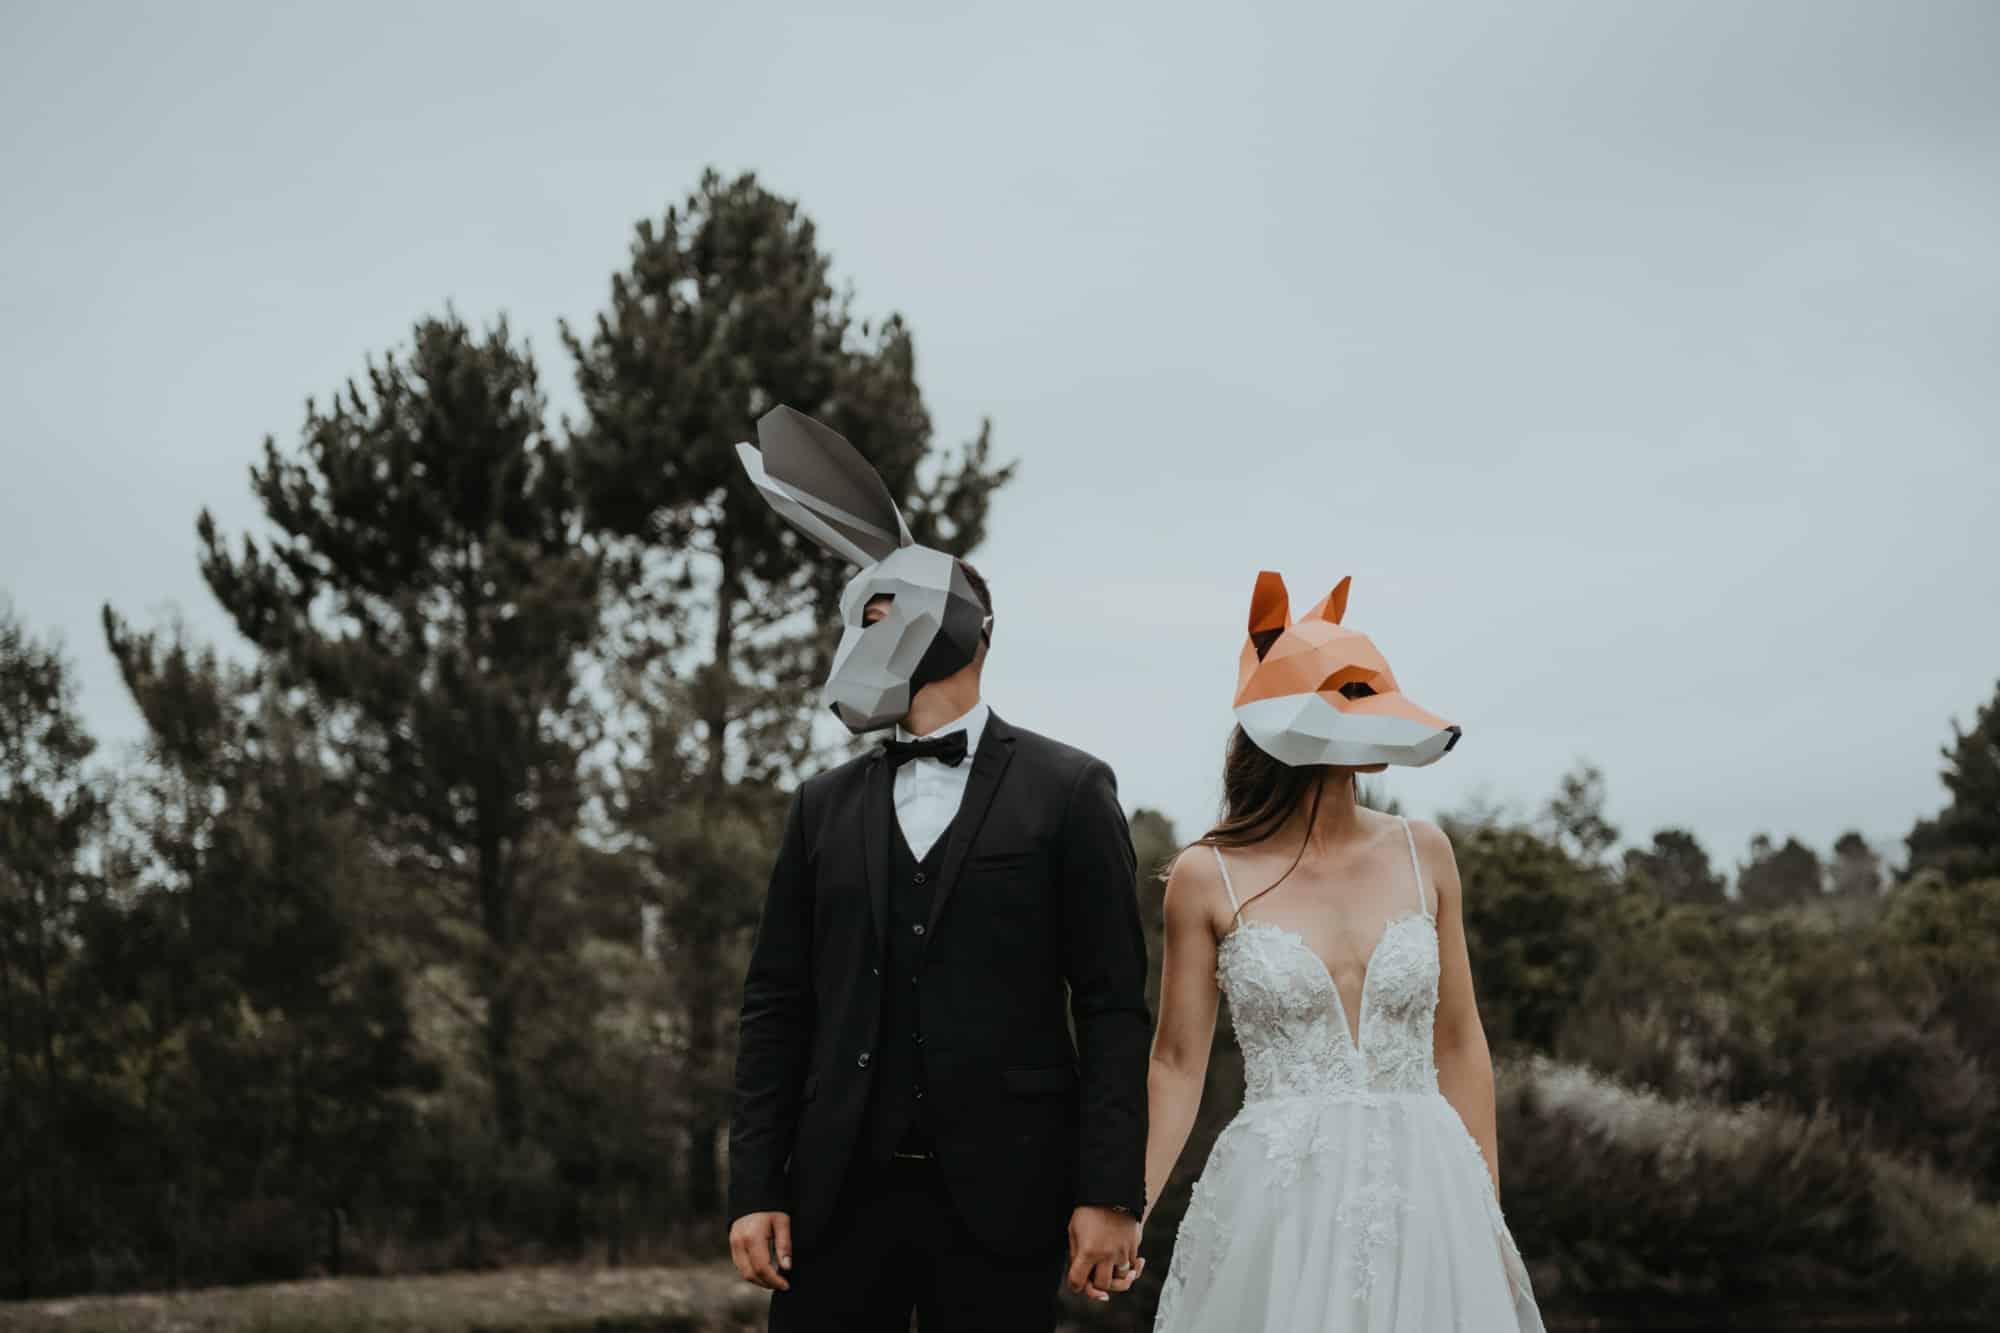 michaela-buzz-newstead-wedding-photography-sharyn-hodges-744